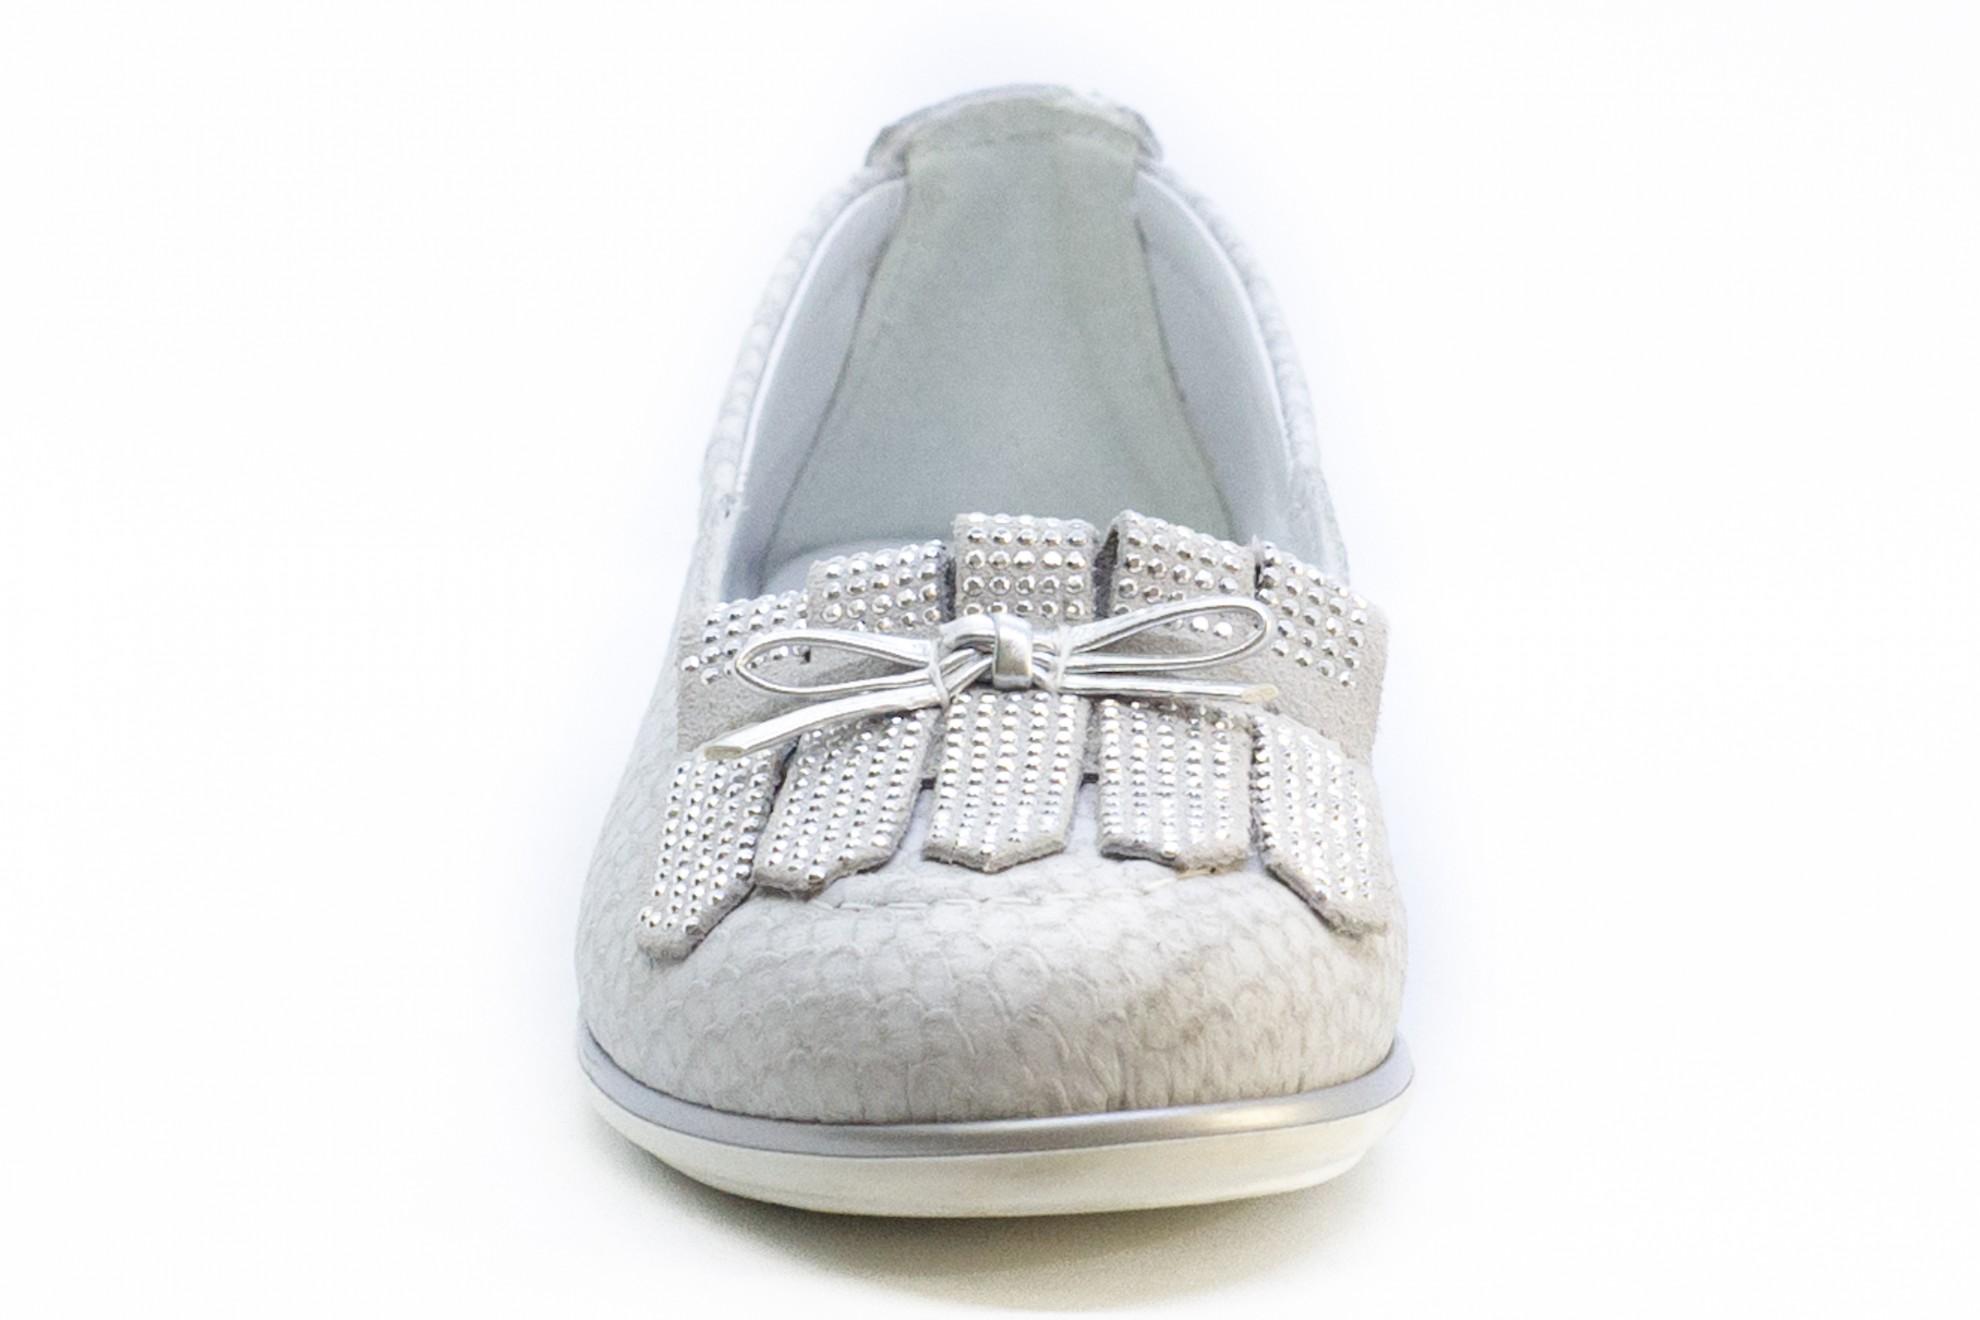 Pantofi casual cu franjuri si strasuri argintii